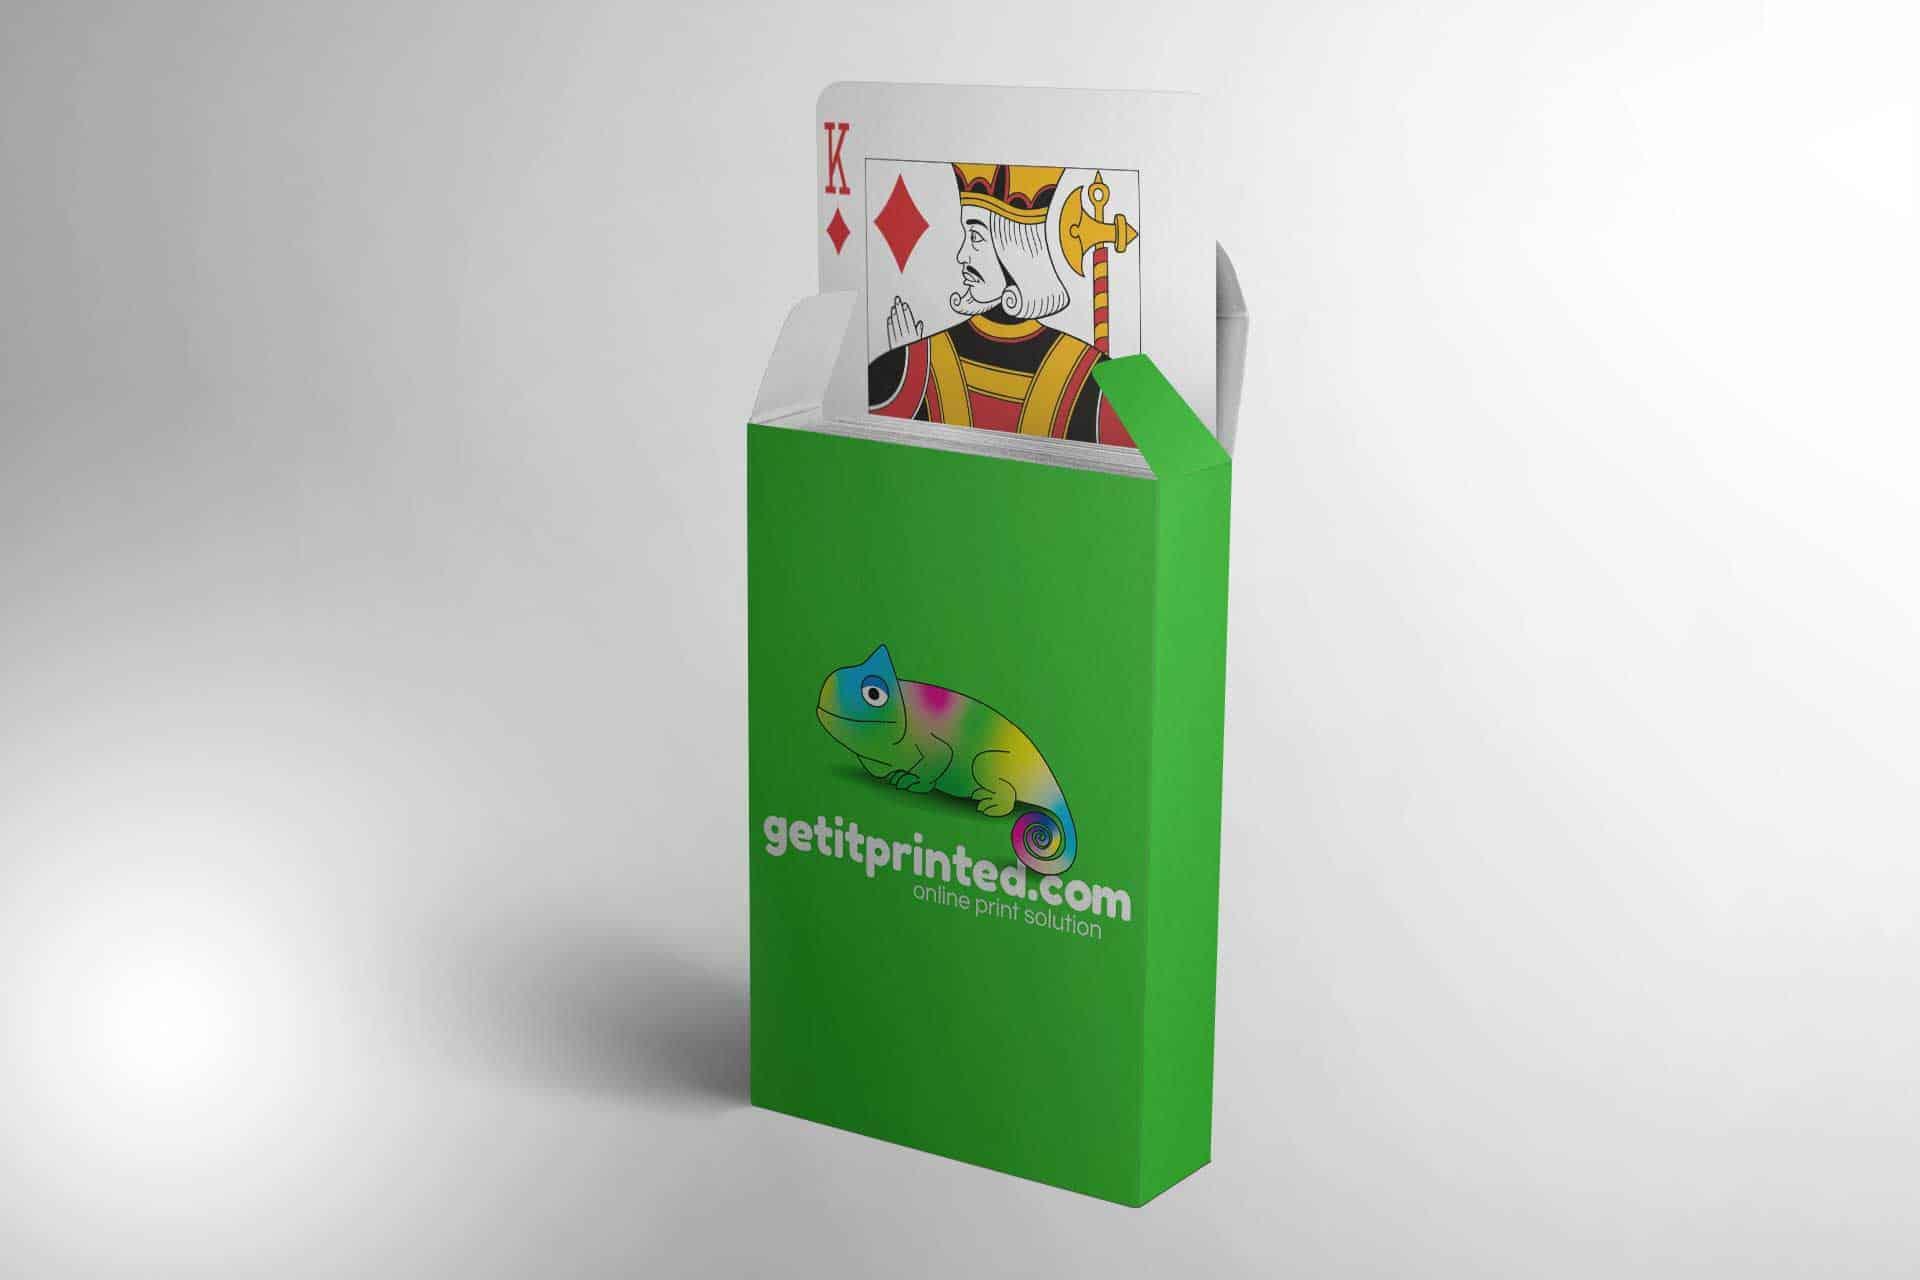 plaing-cards-custom-box-print-getitprinted.com_3